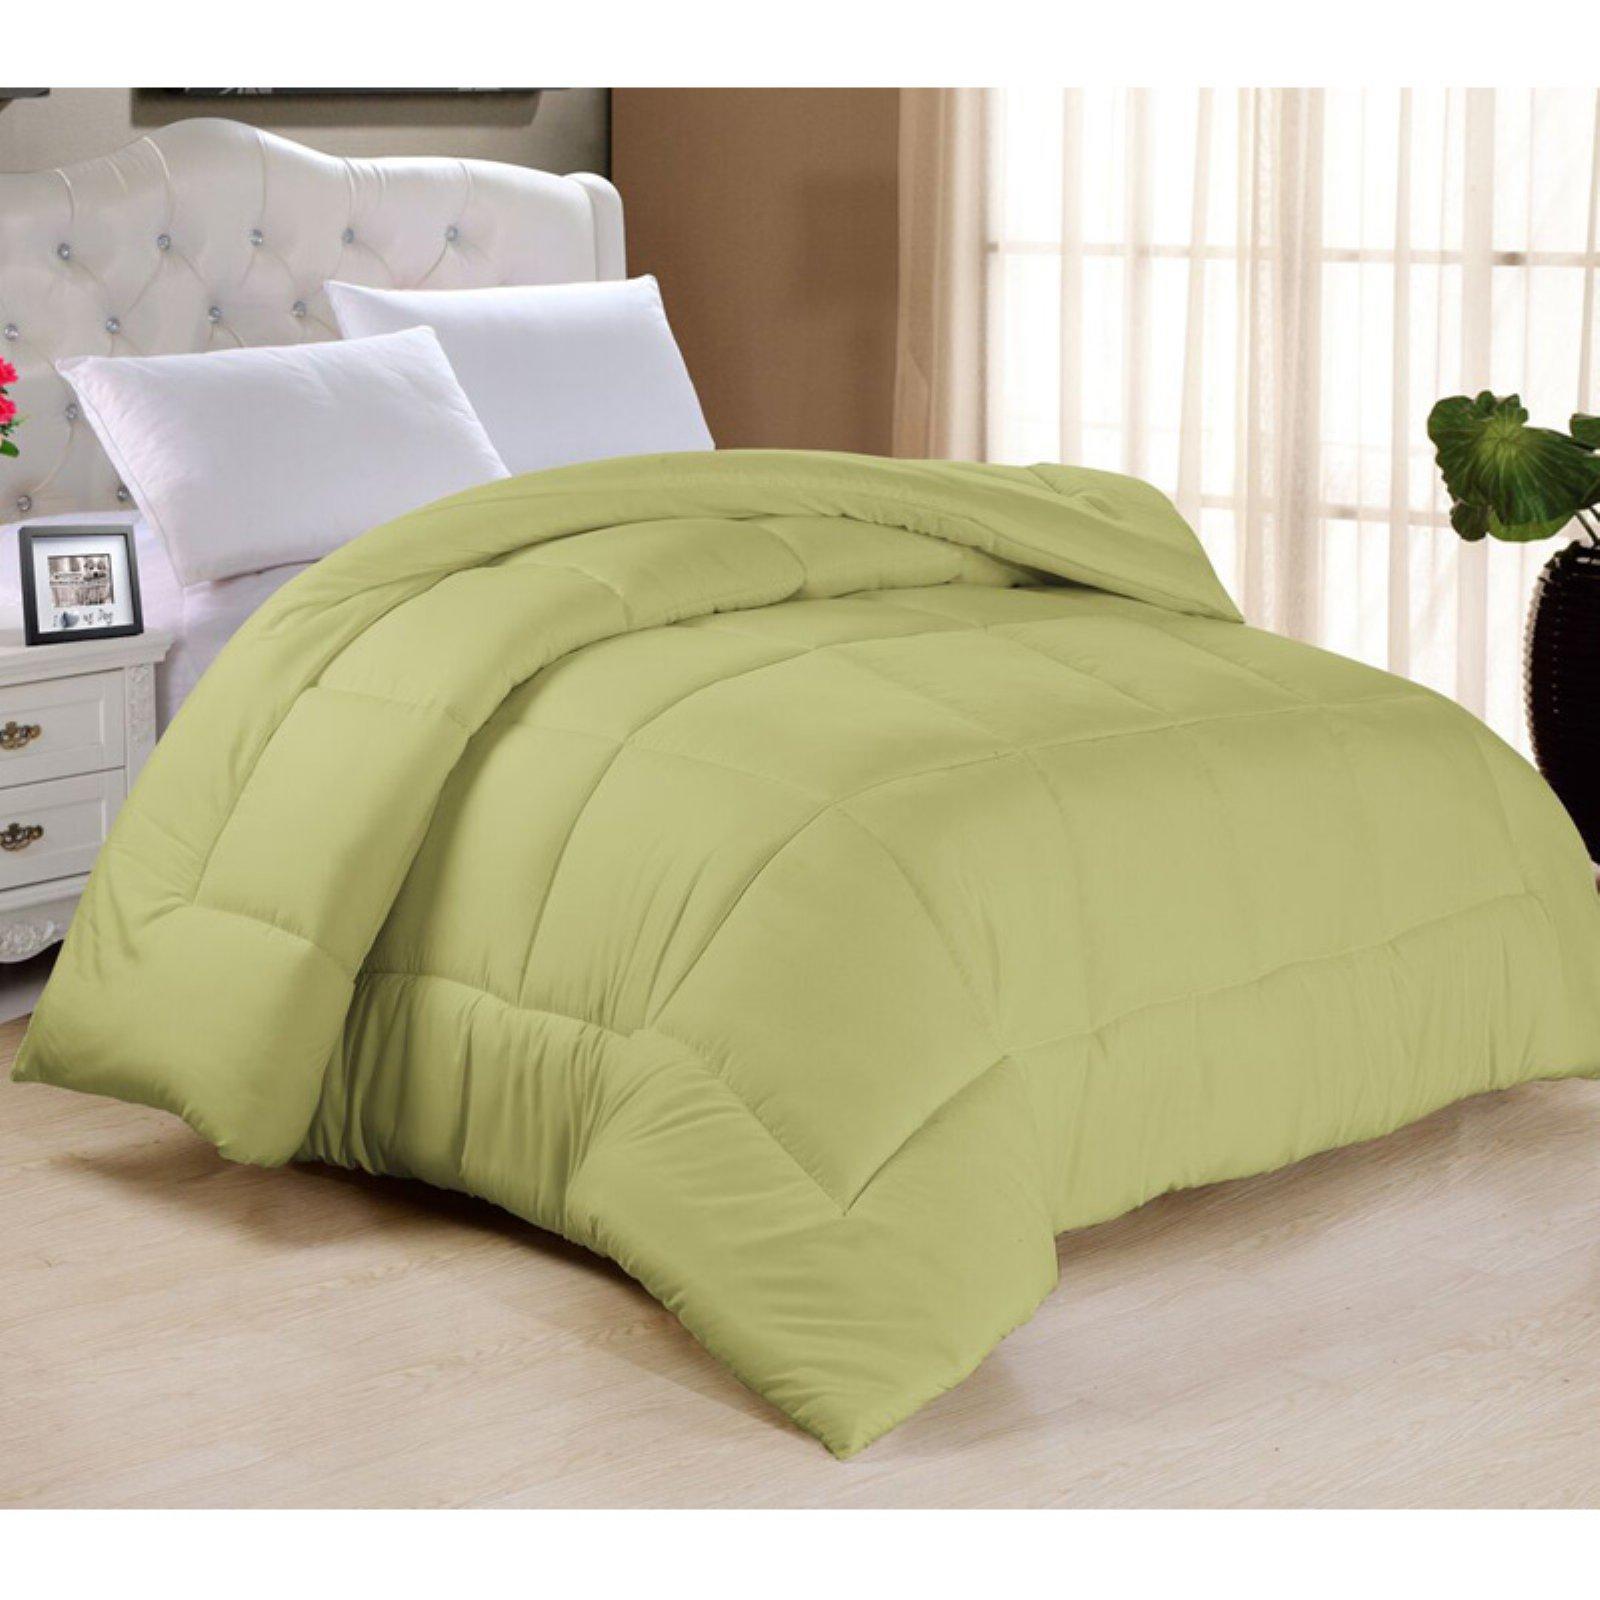 Plush Soft All Season Down Alternative Comforter Sage King//California King